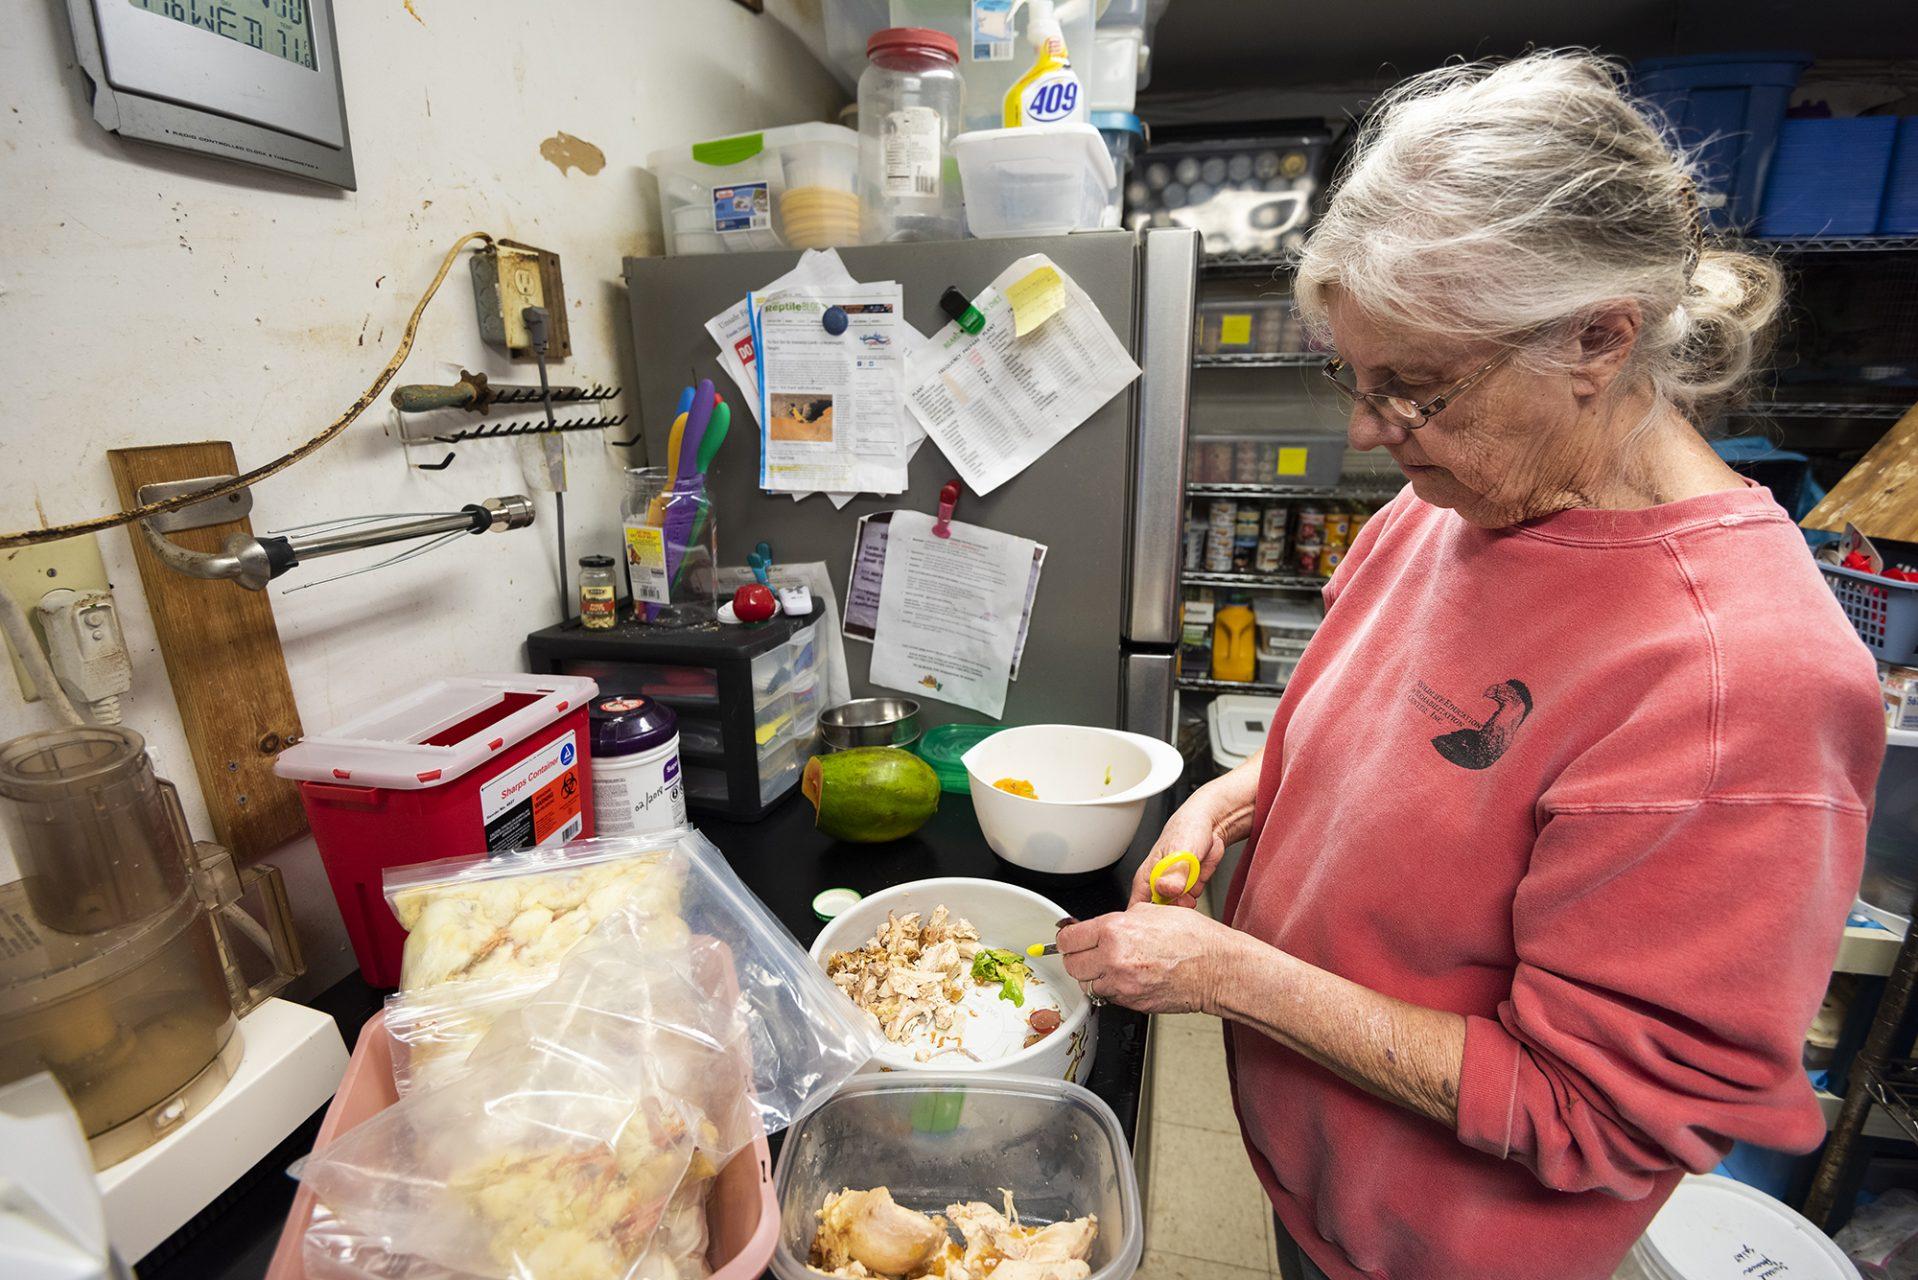 Gail Preparing Skunk Food